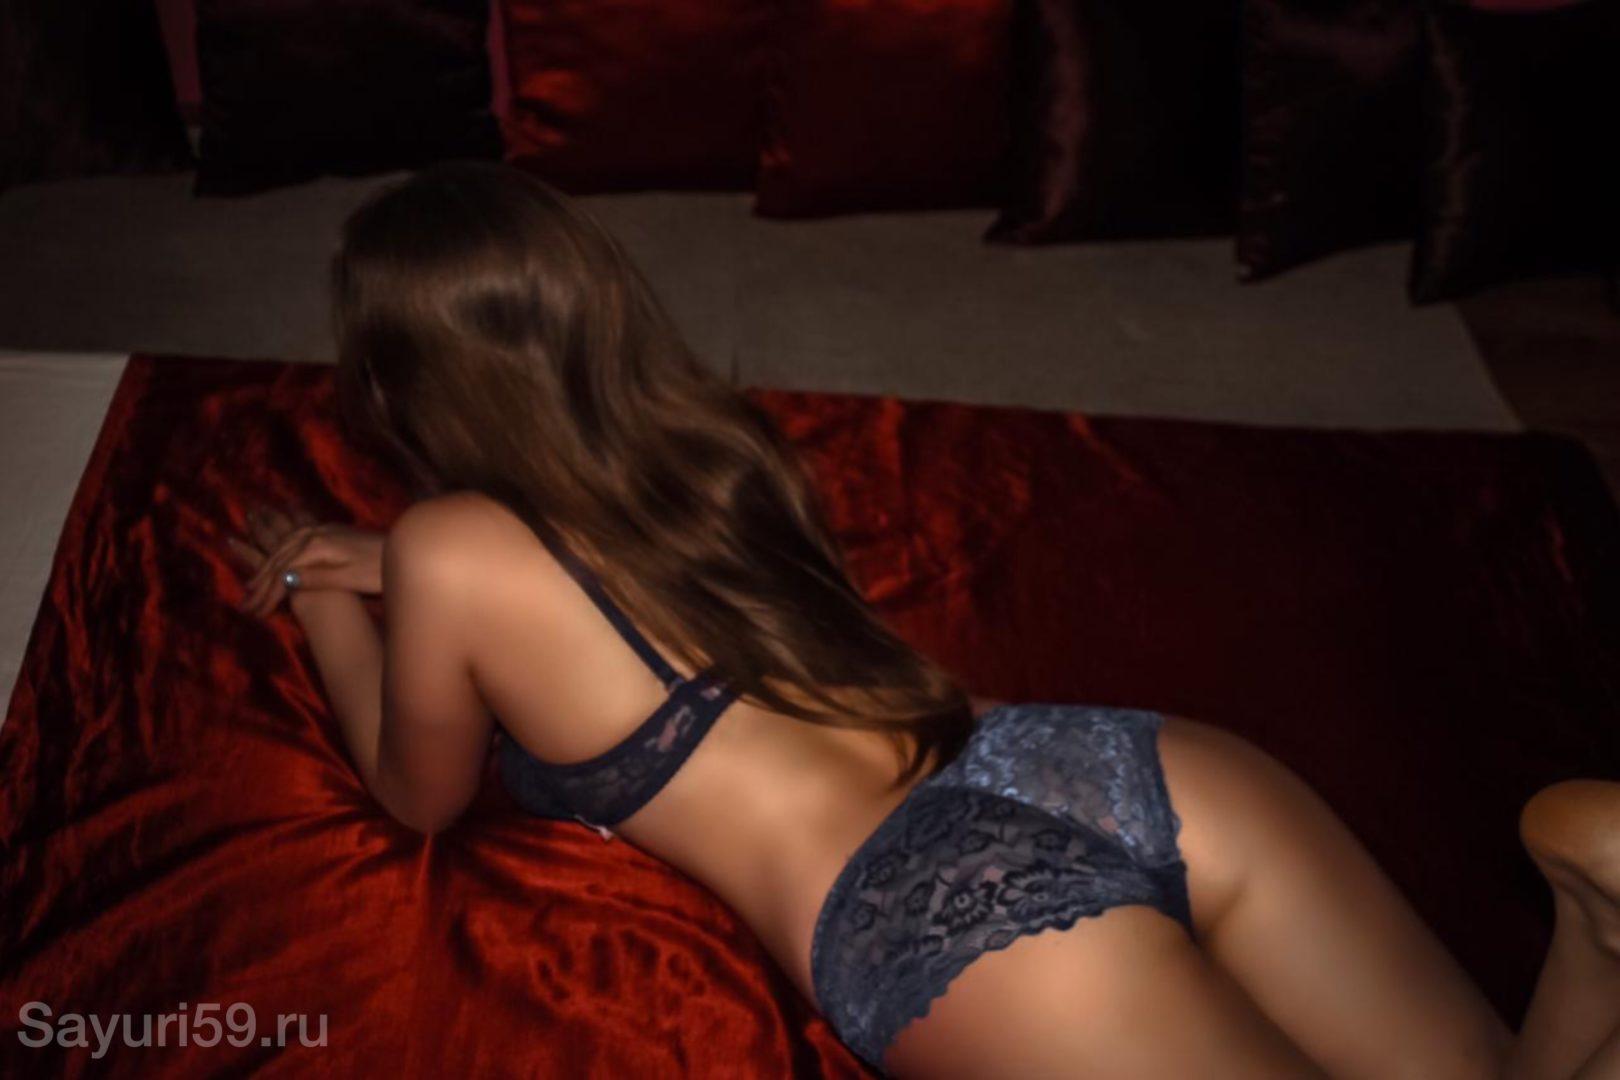 Татьяна - мастер эротического массажа